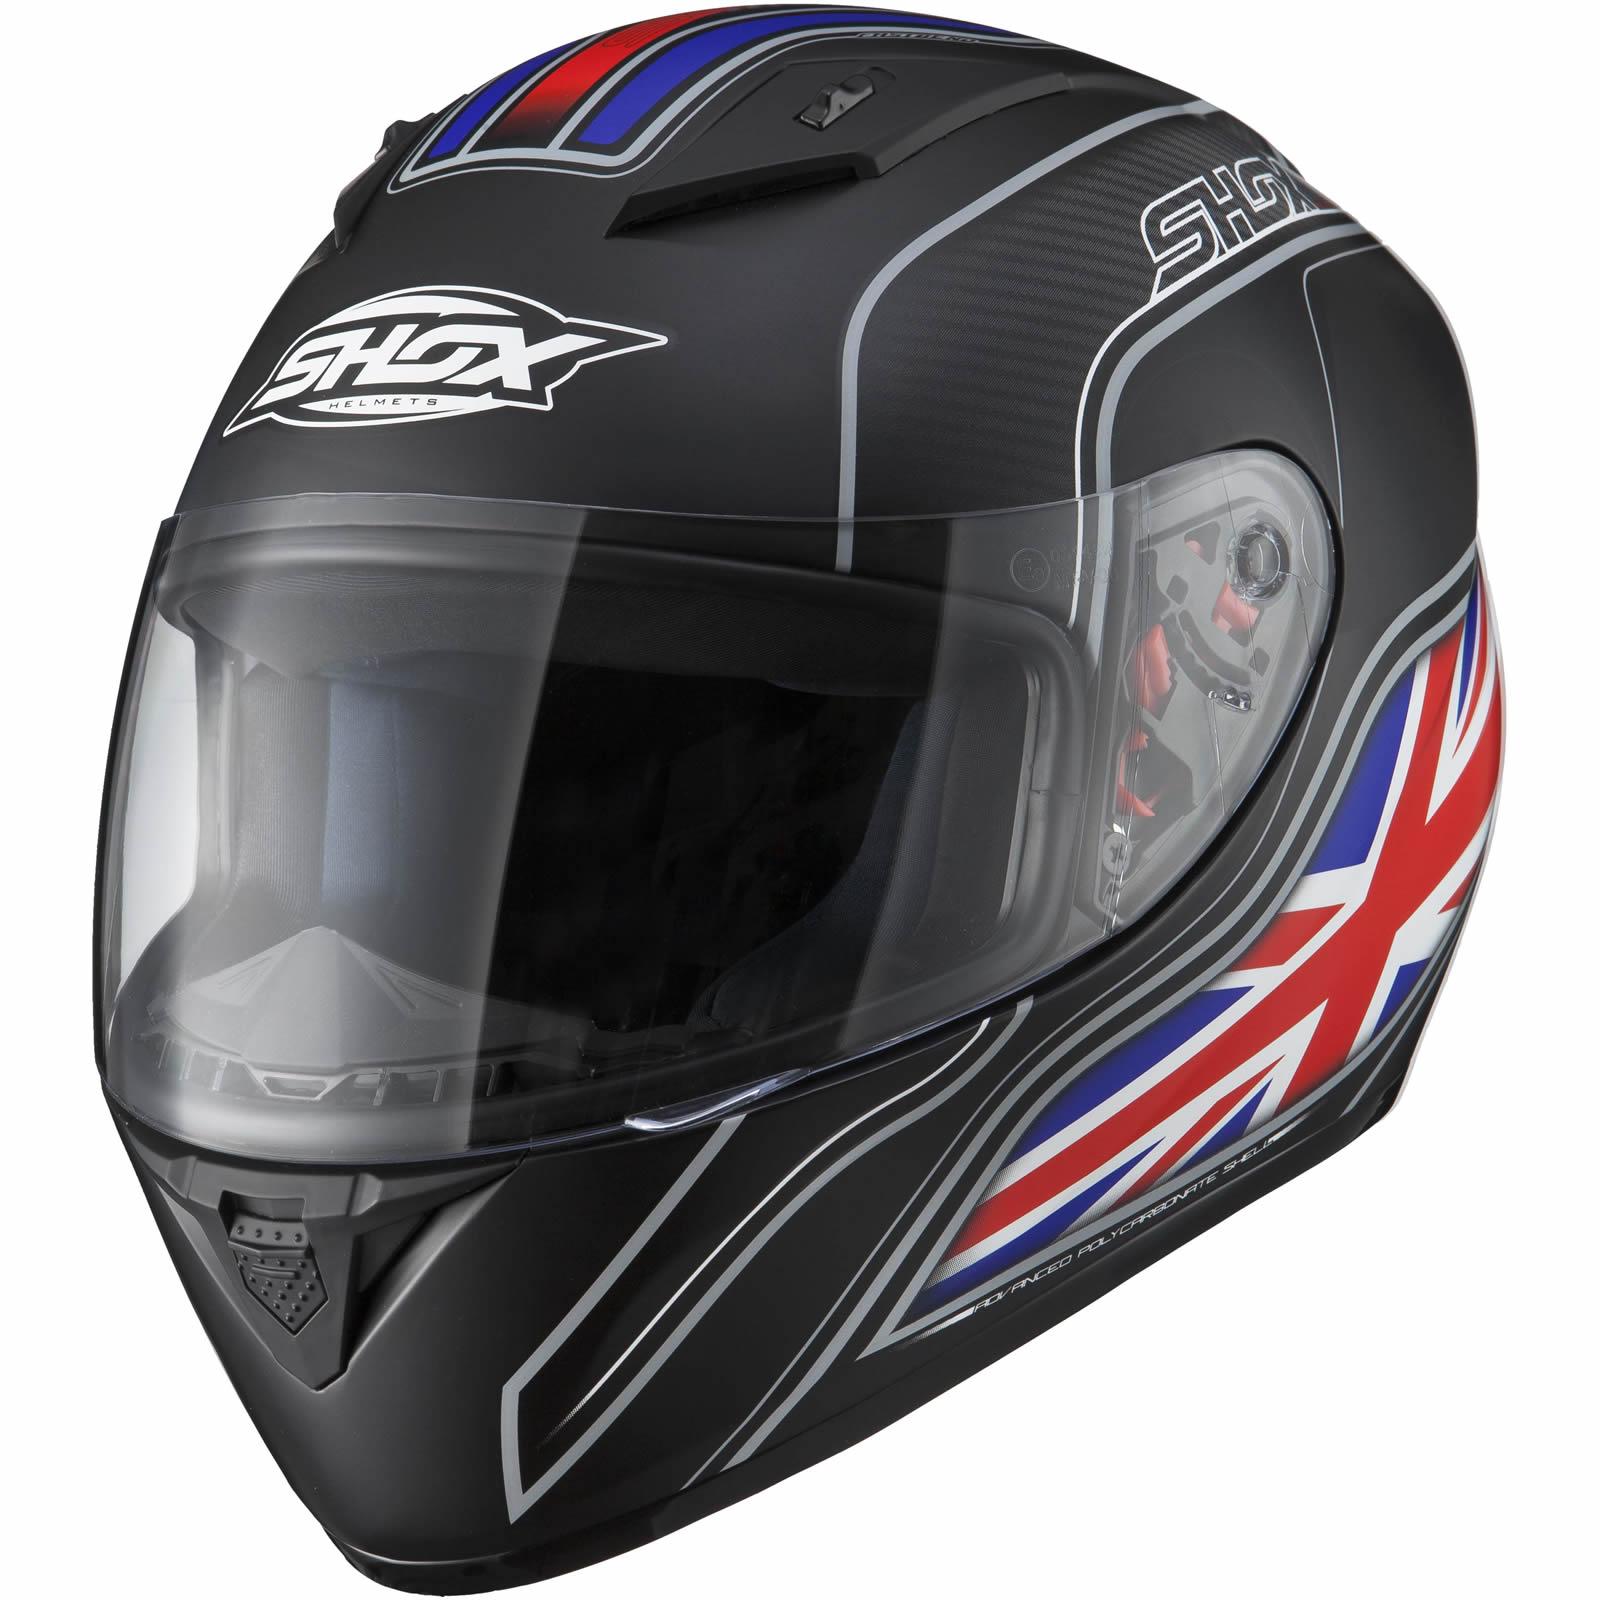 Shox Axxis Identity Motorcycle Matt Black Helmet Motorbike Full Face £31.99 ebay / ghostbikes_uk